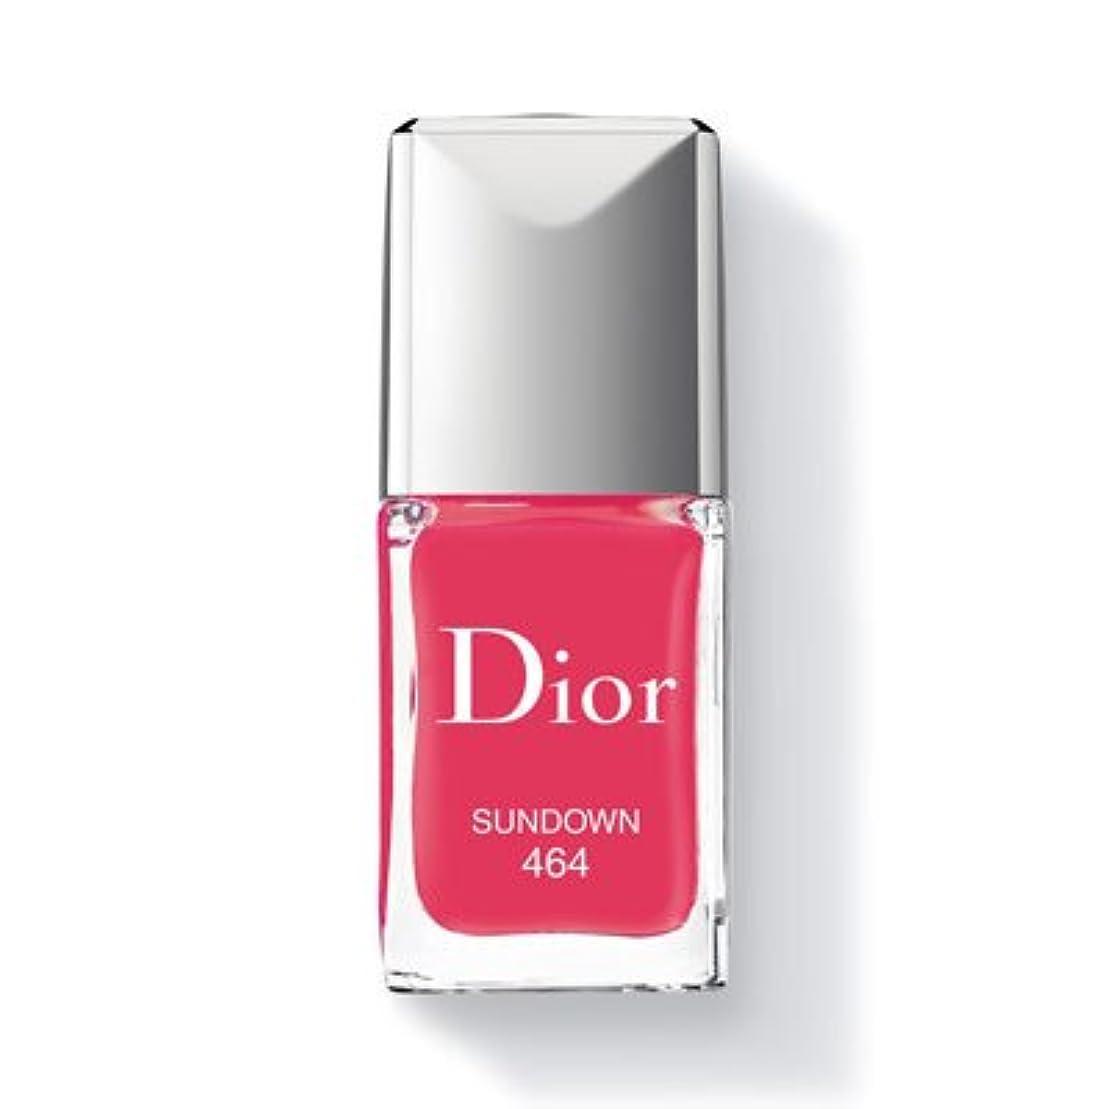 Christian Dior クリスチャン ディオール ディオール ヴェルニ #464 SUNDOWN 10ml [並行輸入品]